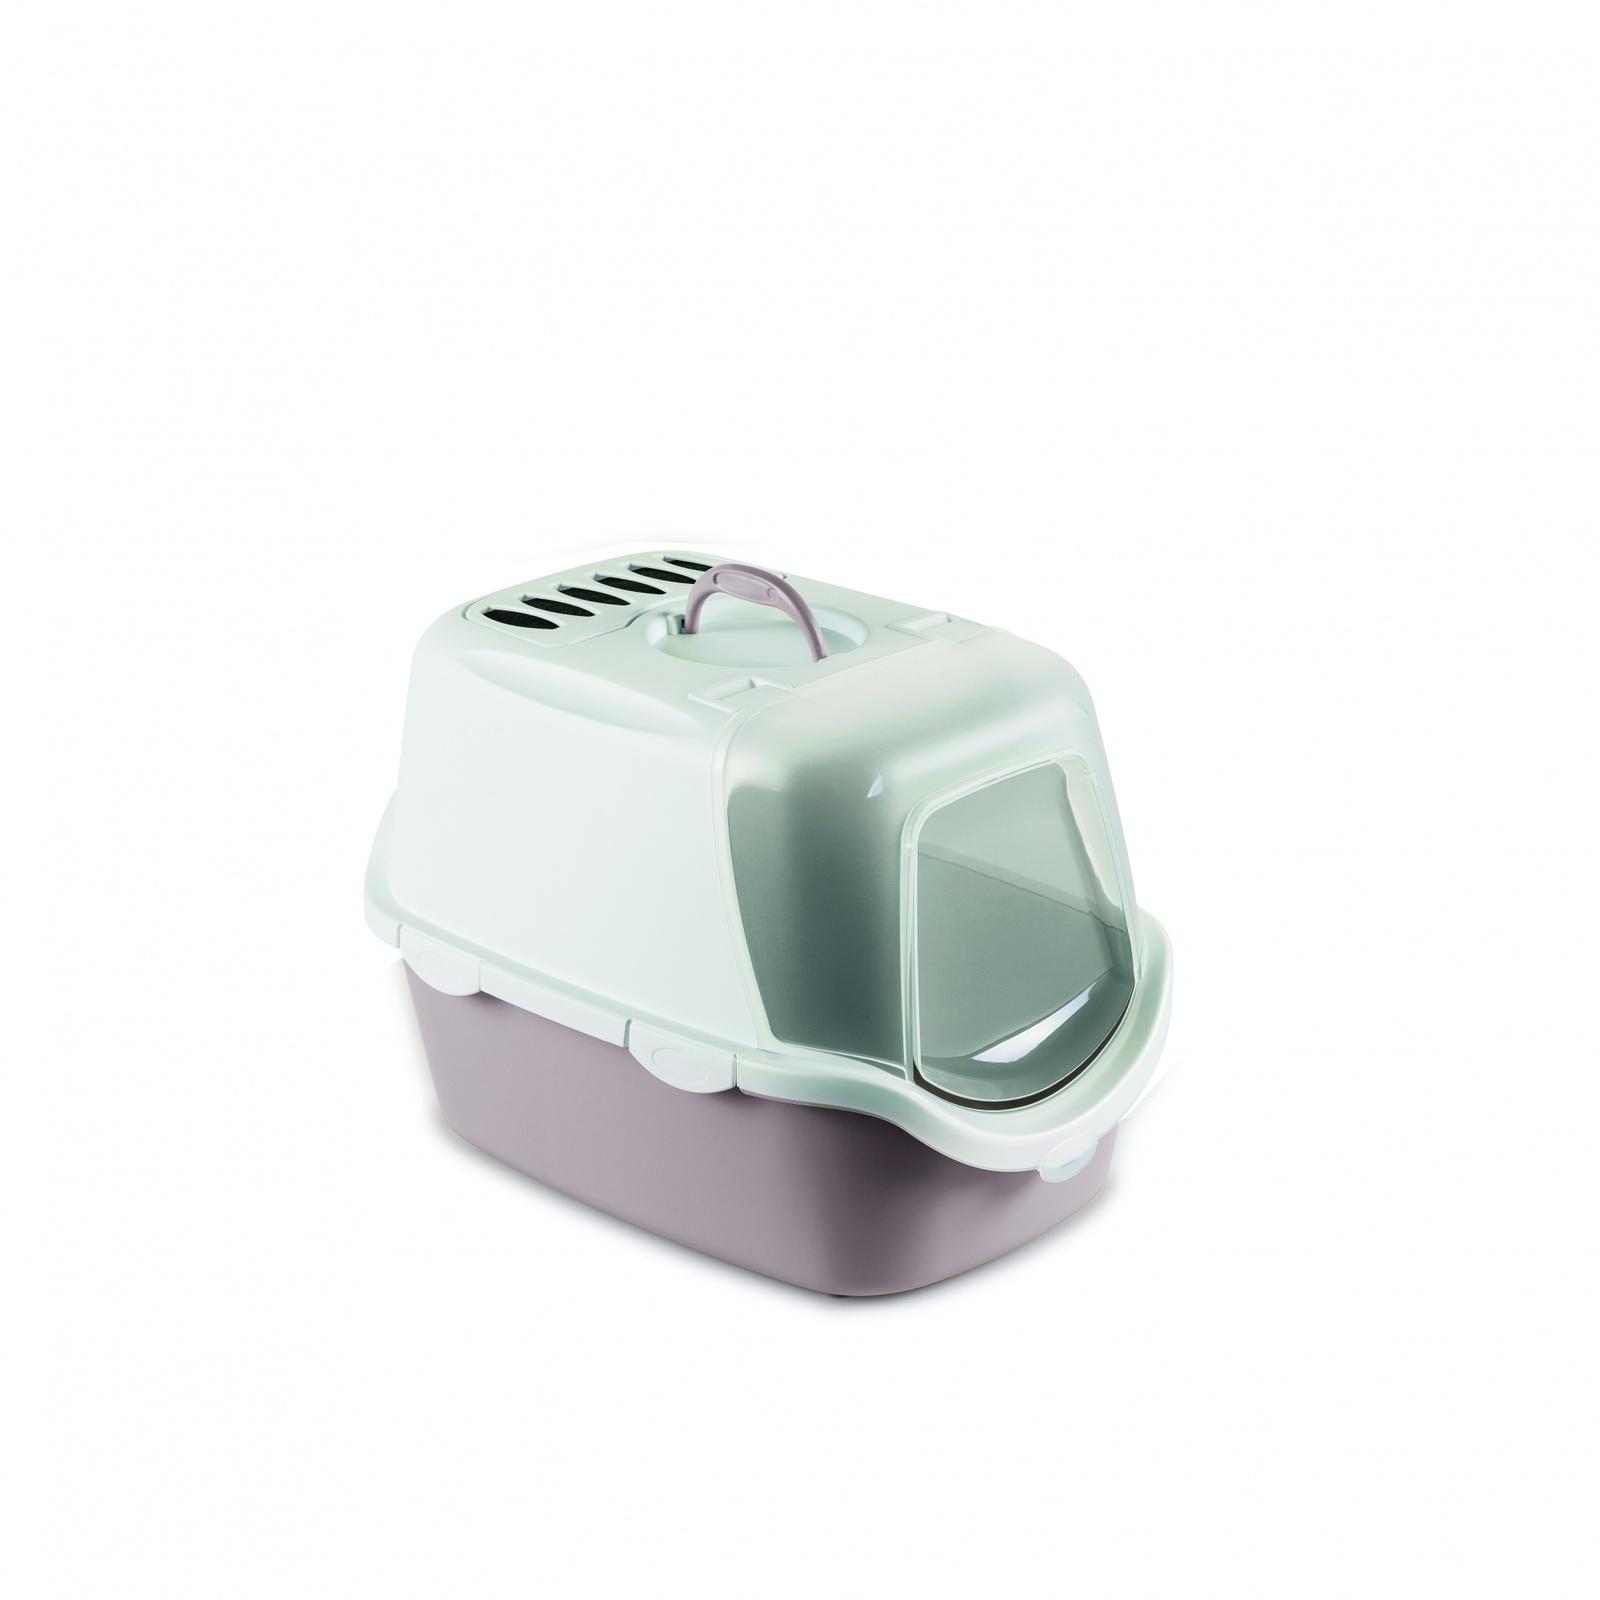 Stefanplast Туалет-Домик Cathy Easy Clean с угольным фильтром, пудровый, 56х40х40 см (1,6 кг)